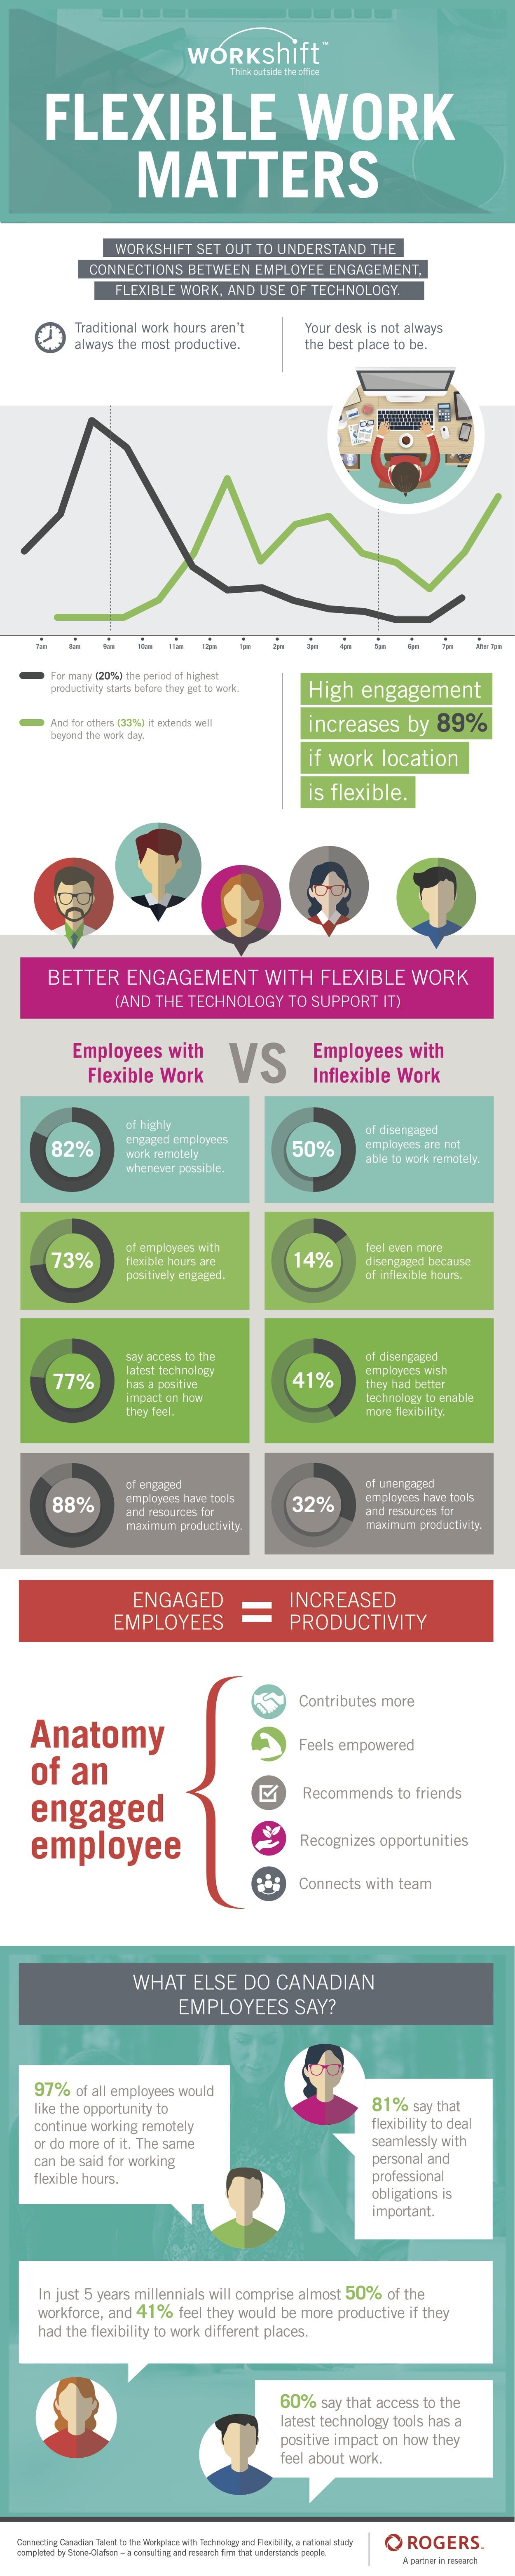 Workshift infographic